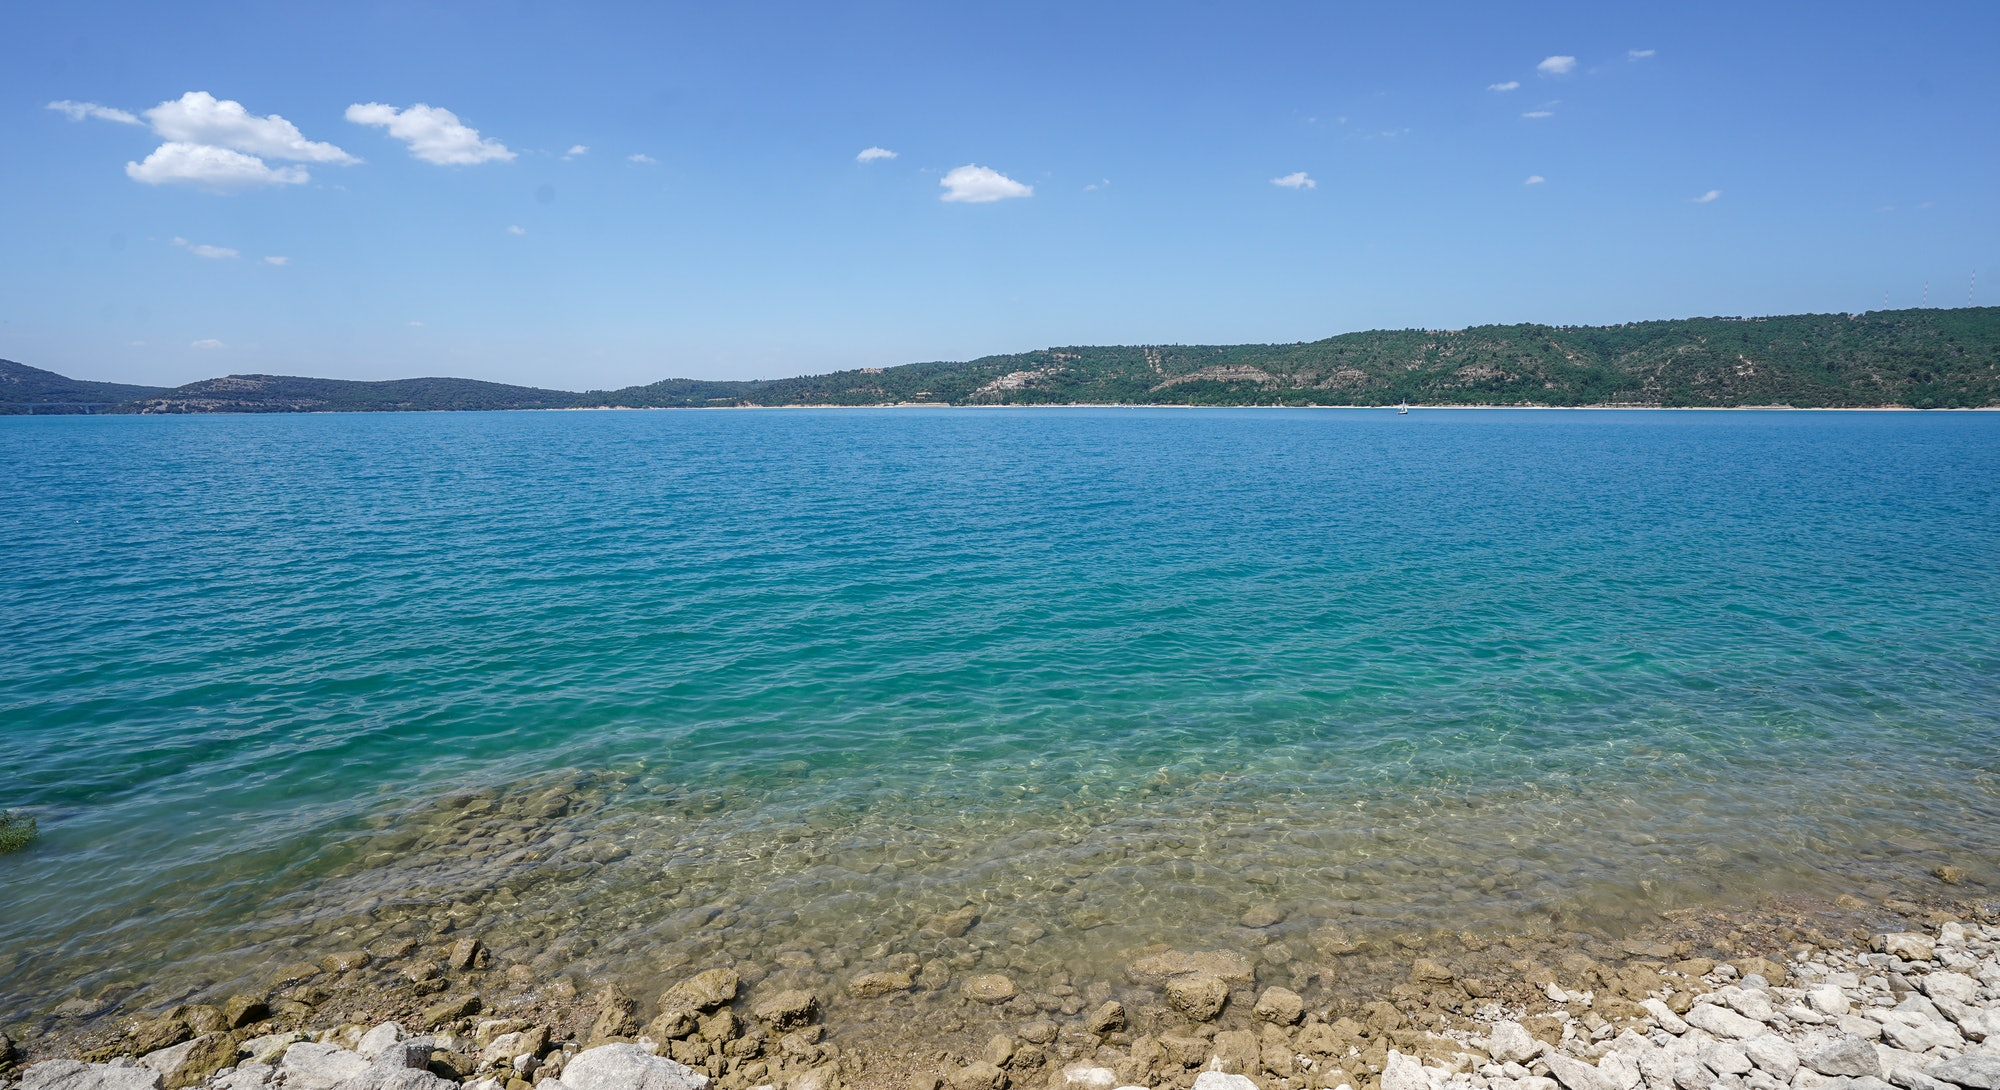 lake pristine water aerial drone